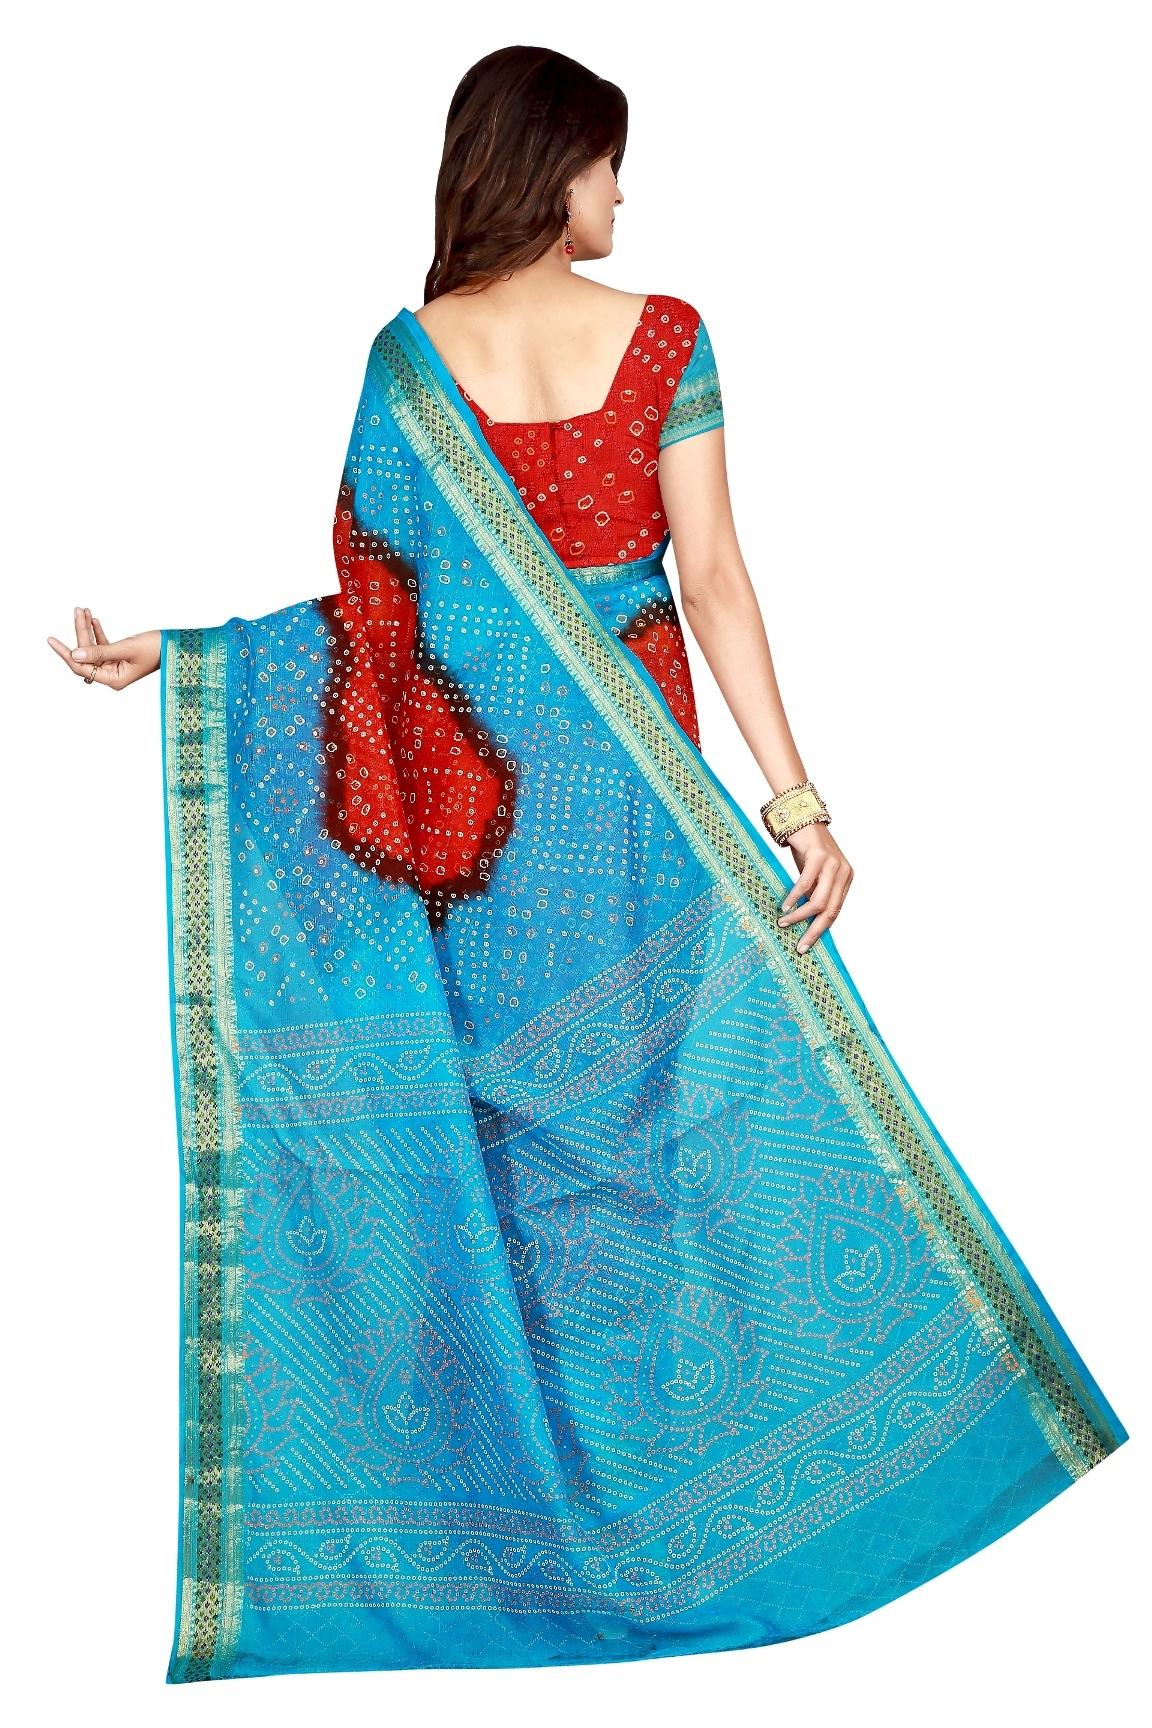 Pure Cotton Saree with zari work border